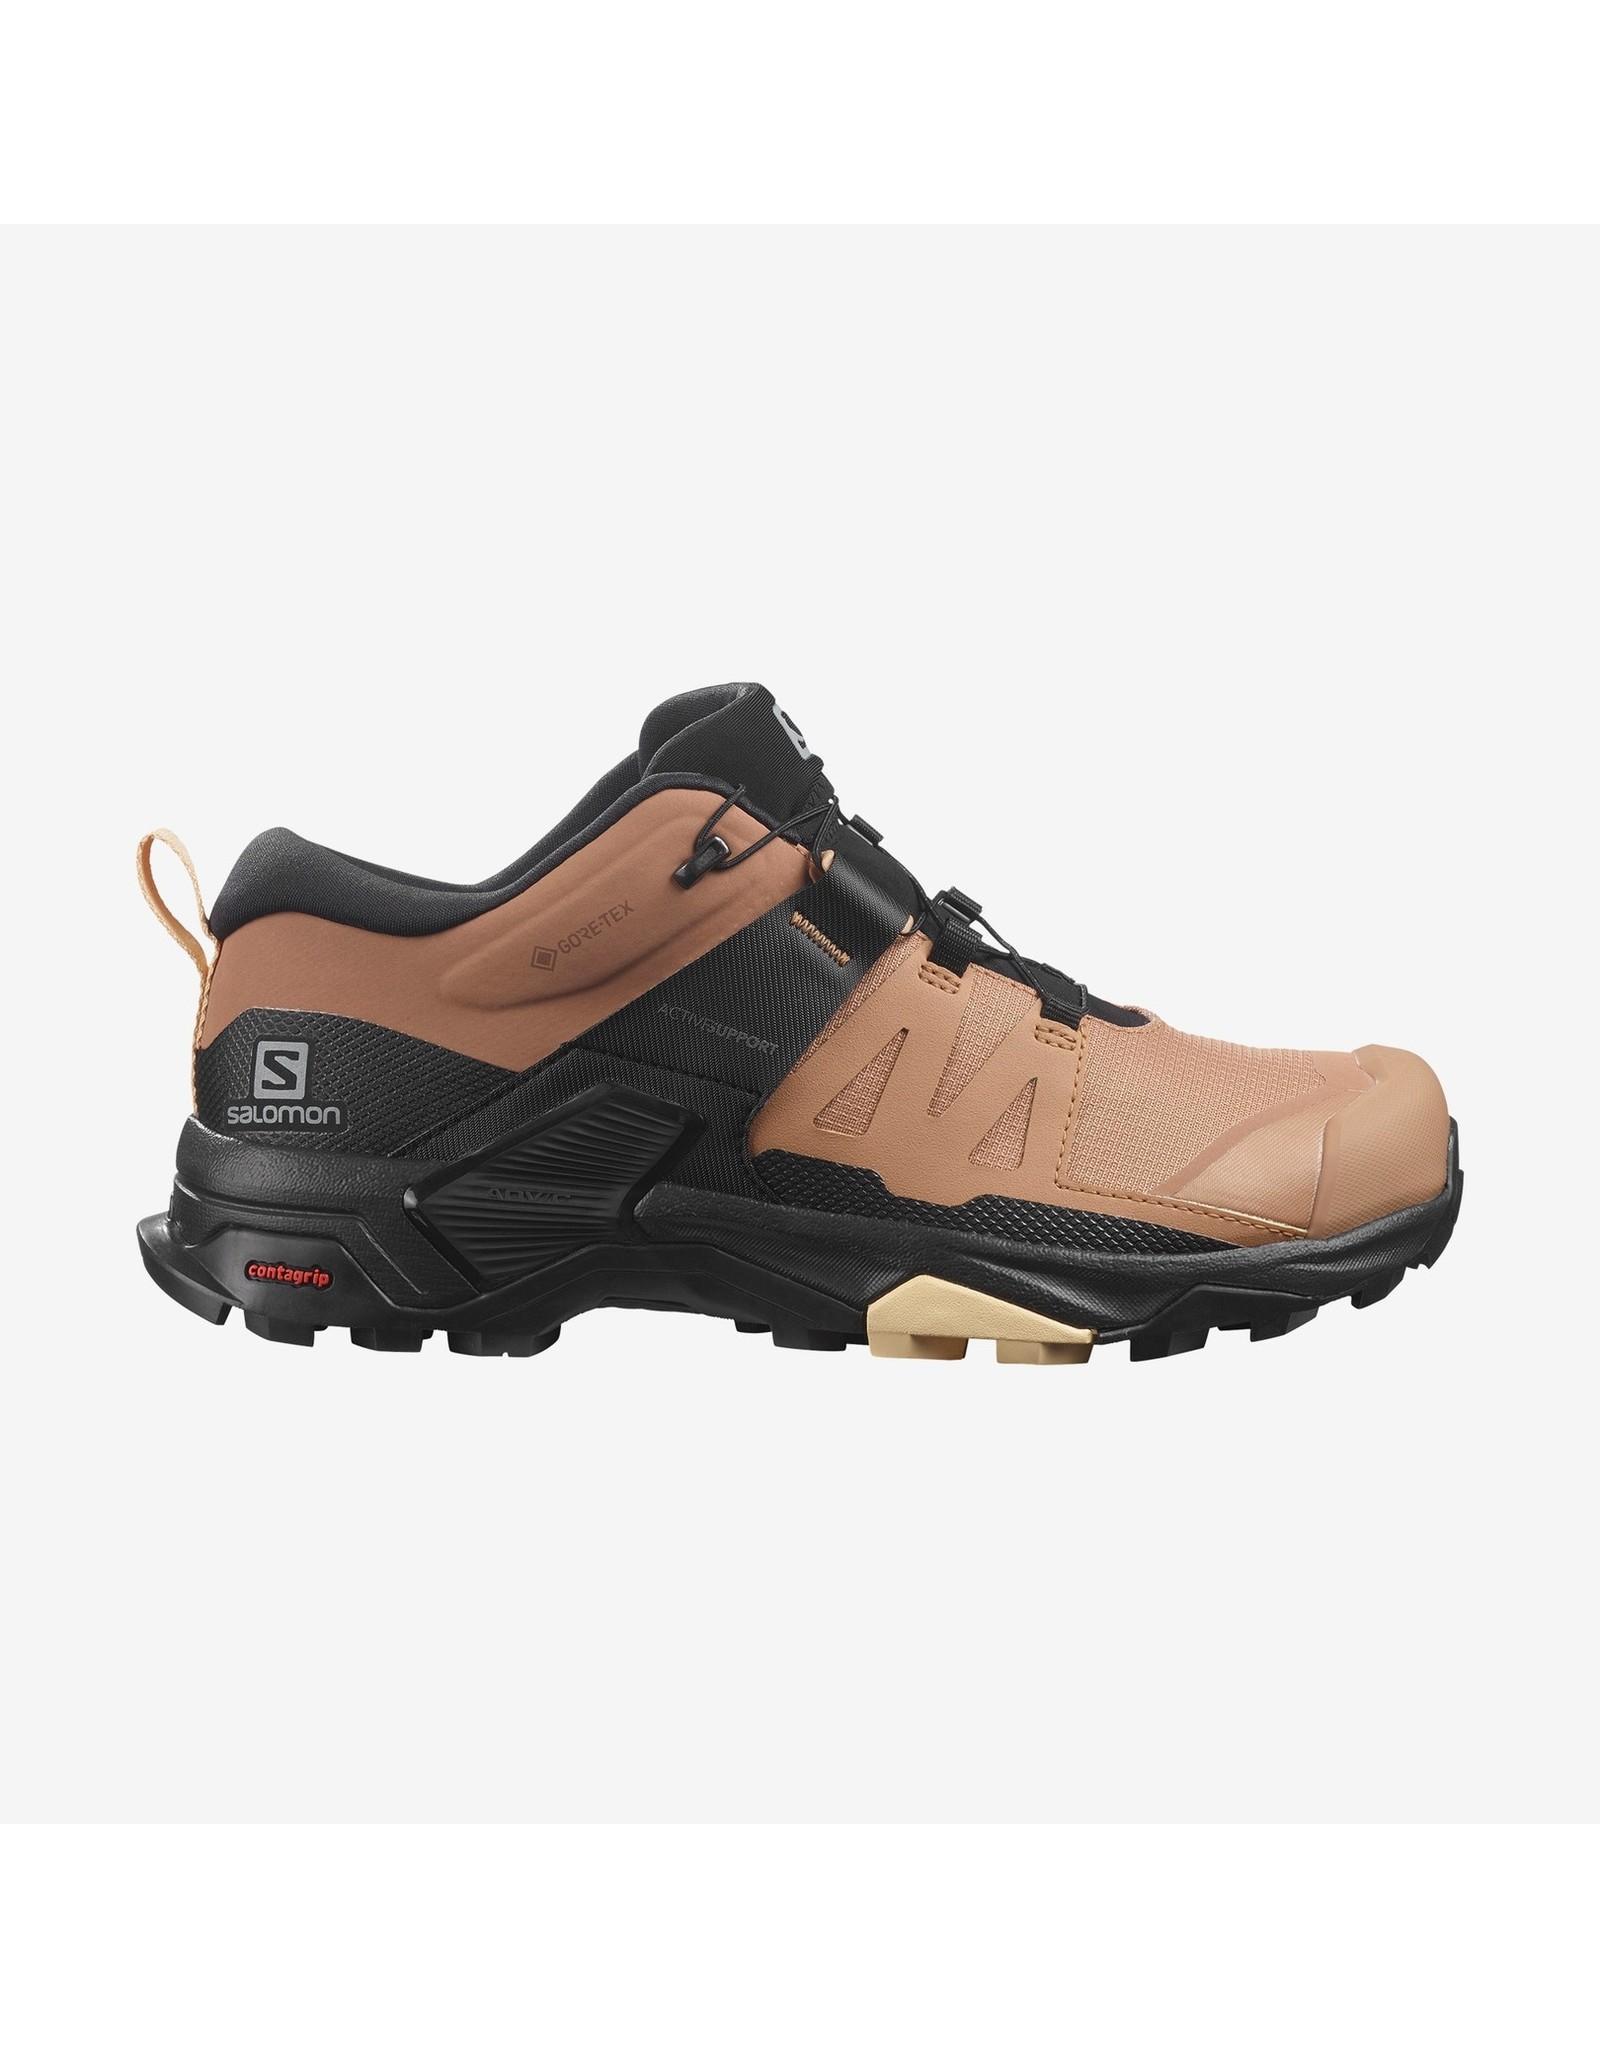 Salomon Salomon X Ultra 4 Gore-Tex Women's Hiking Shoes